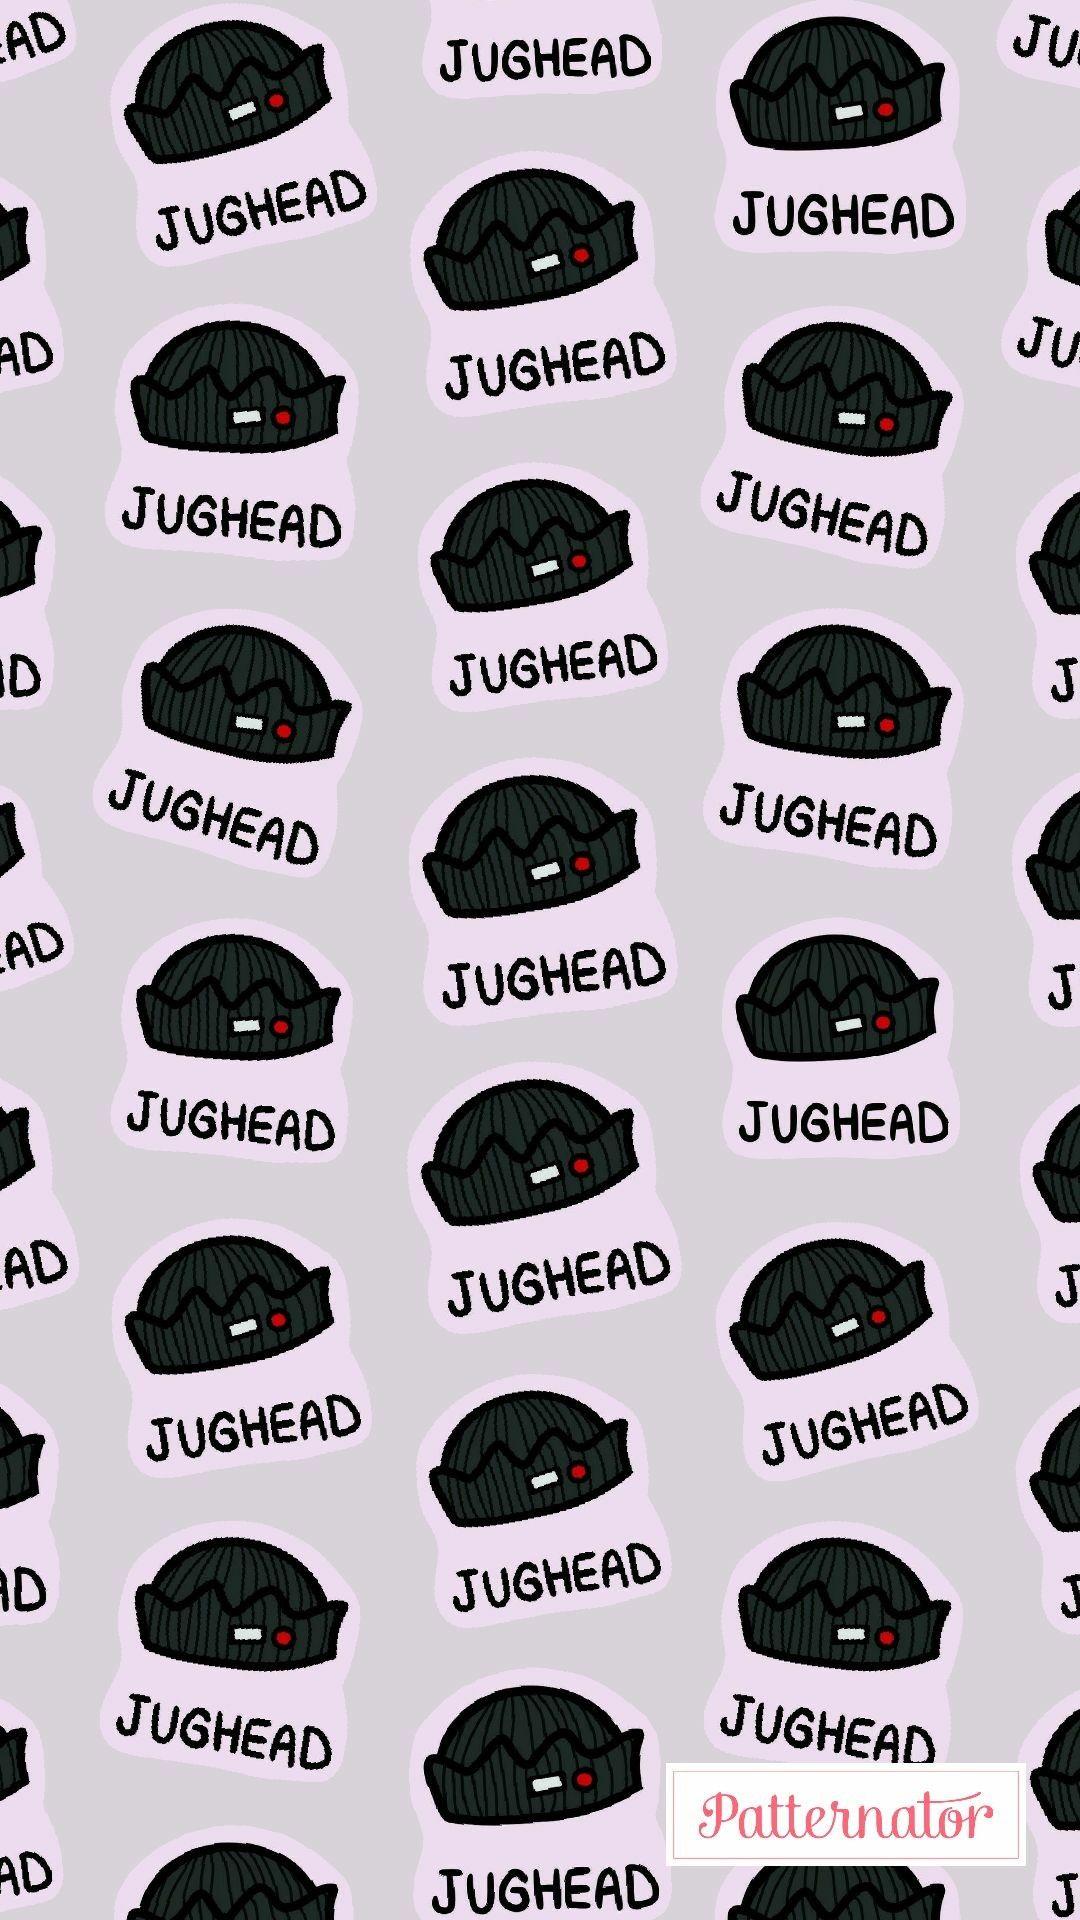 Wallpaper Jughead Riverdale Riverdale Pinterest Wallpaper